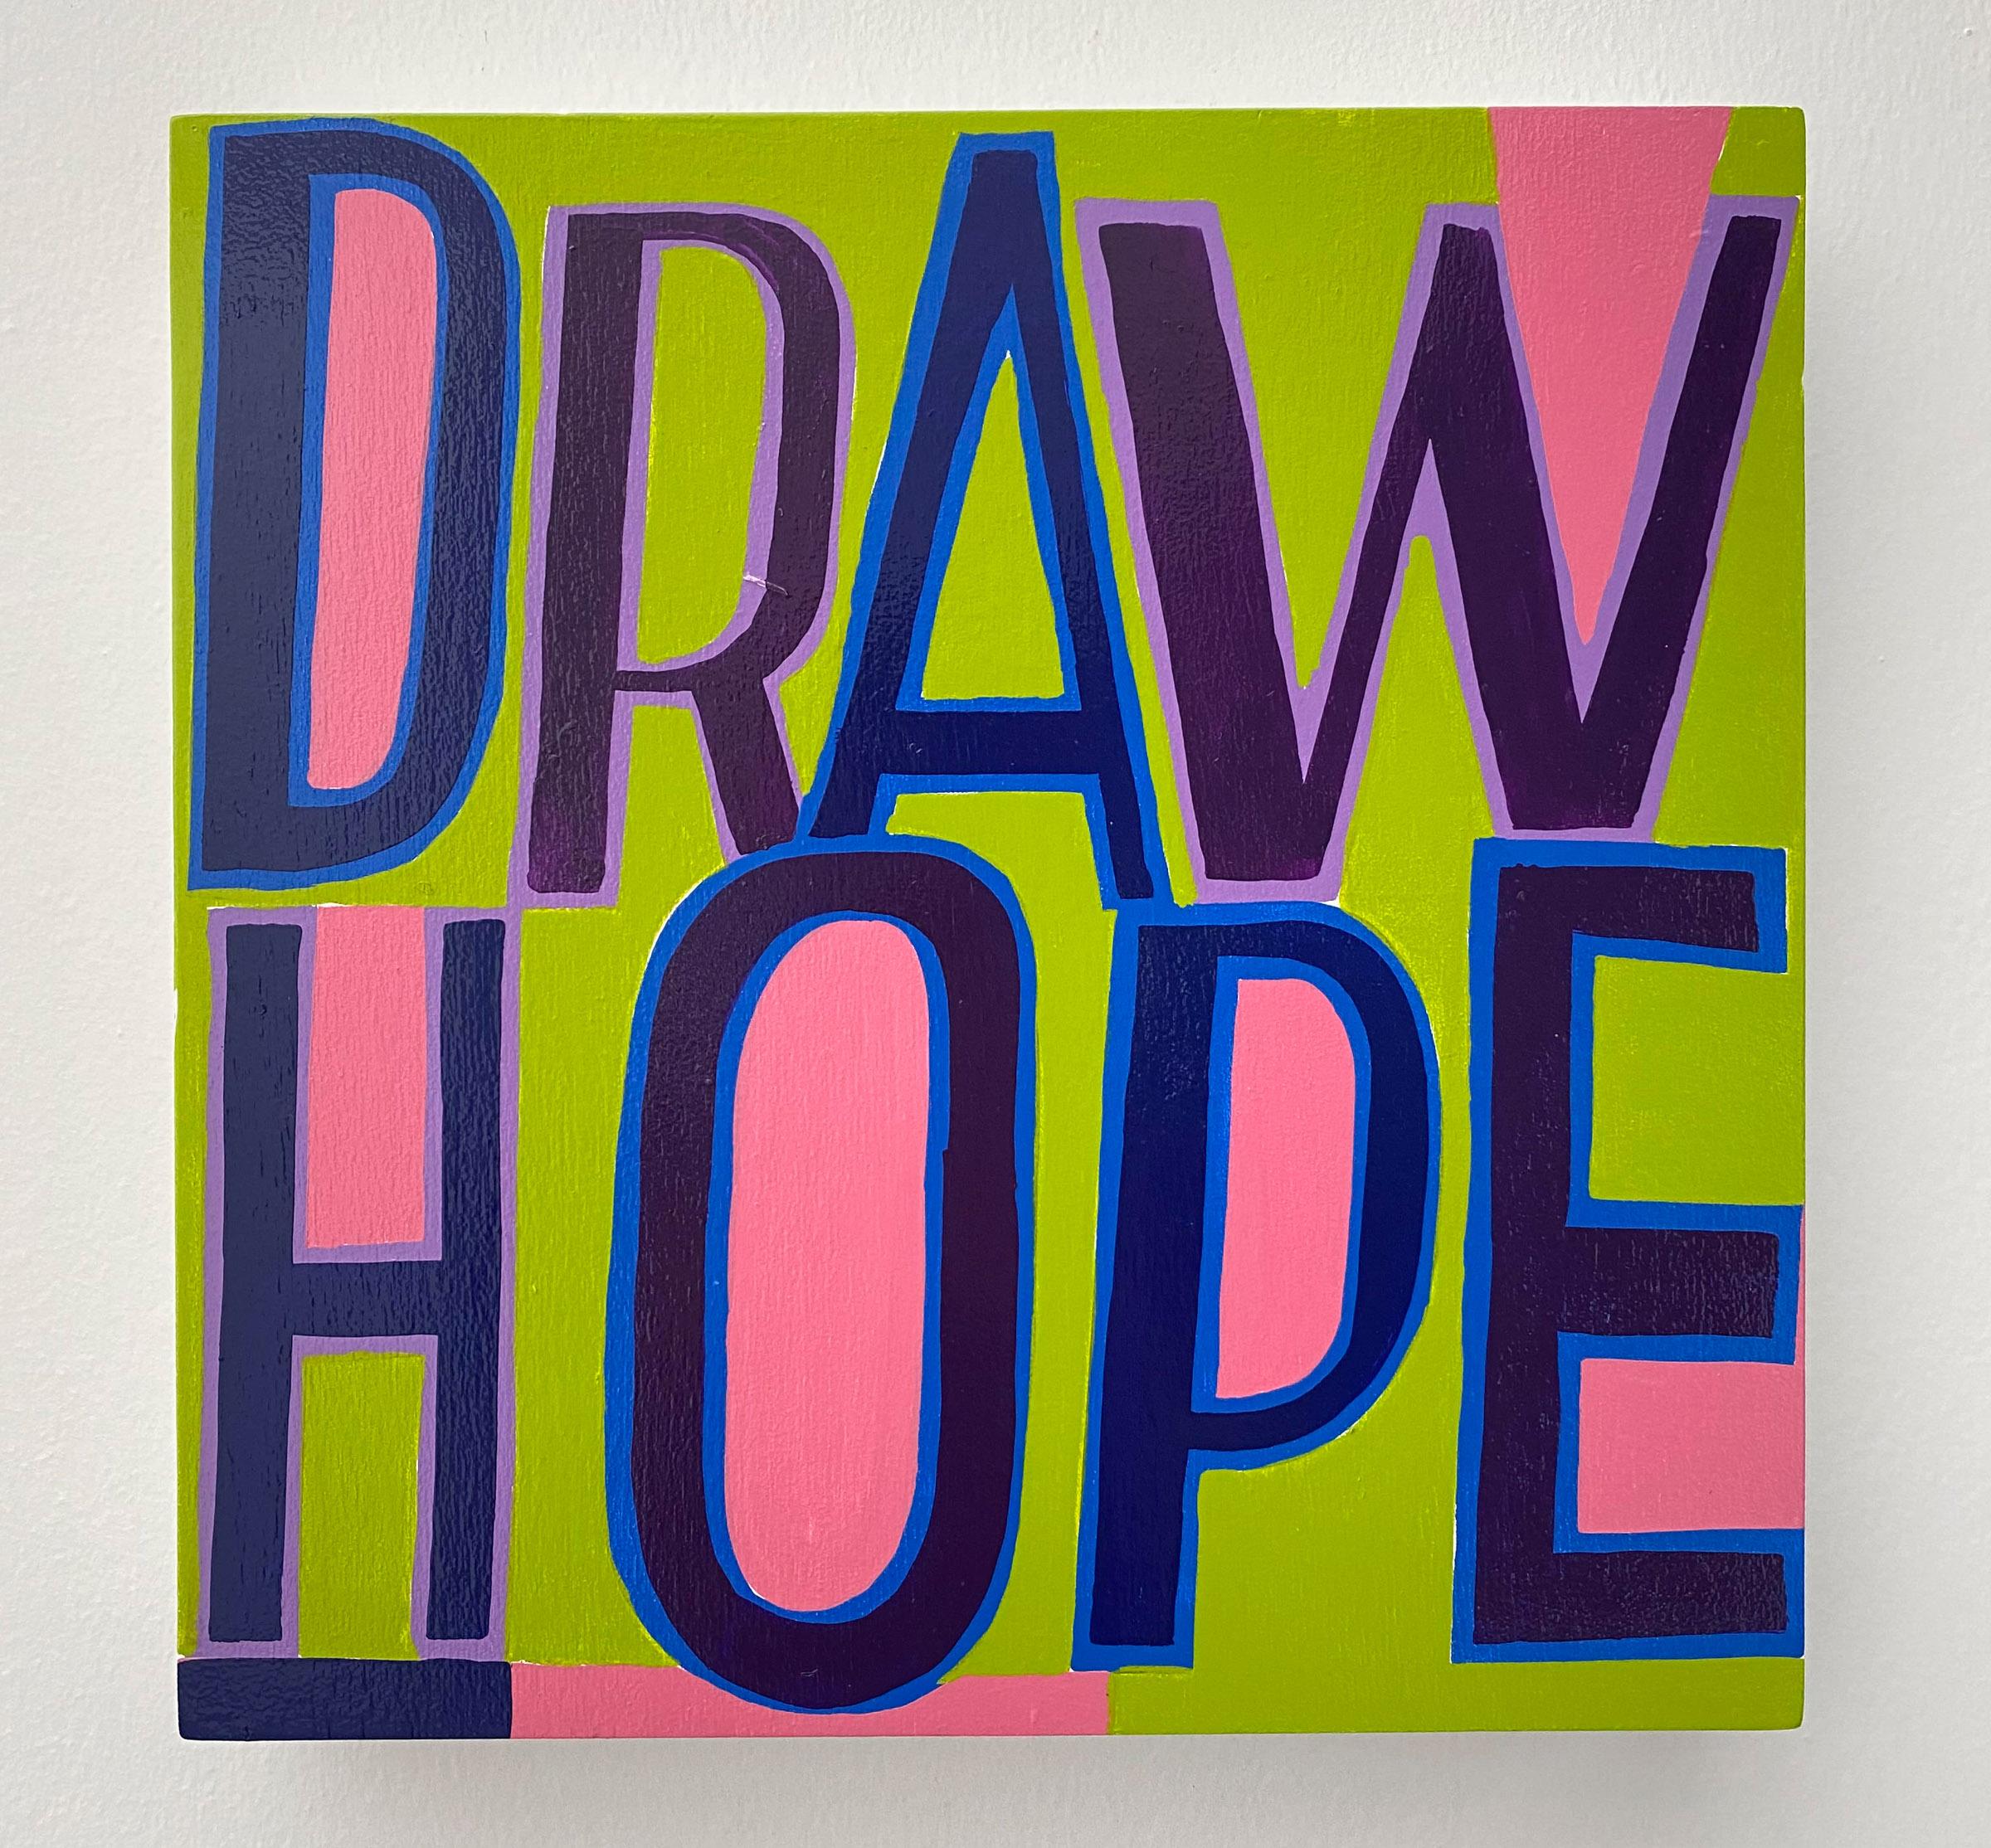 Artwork by Bob & Roberta Smith